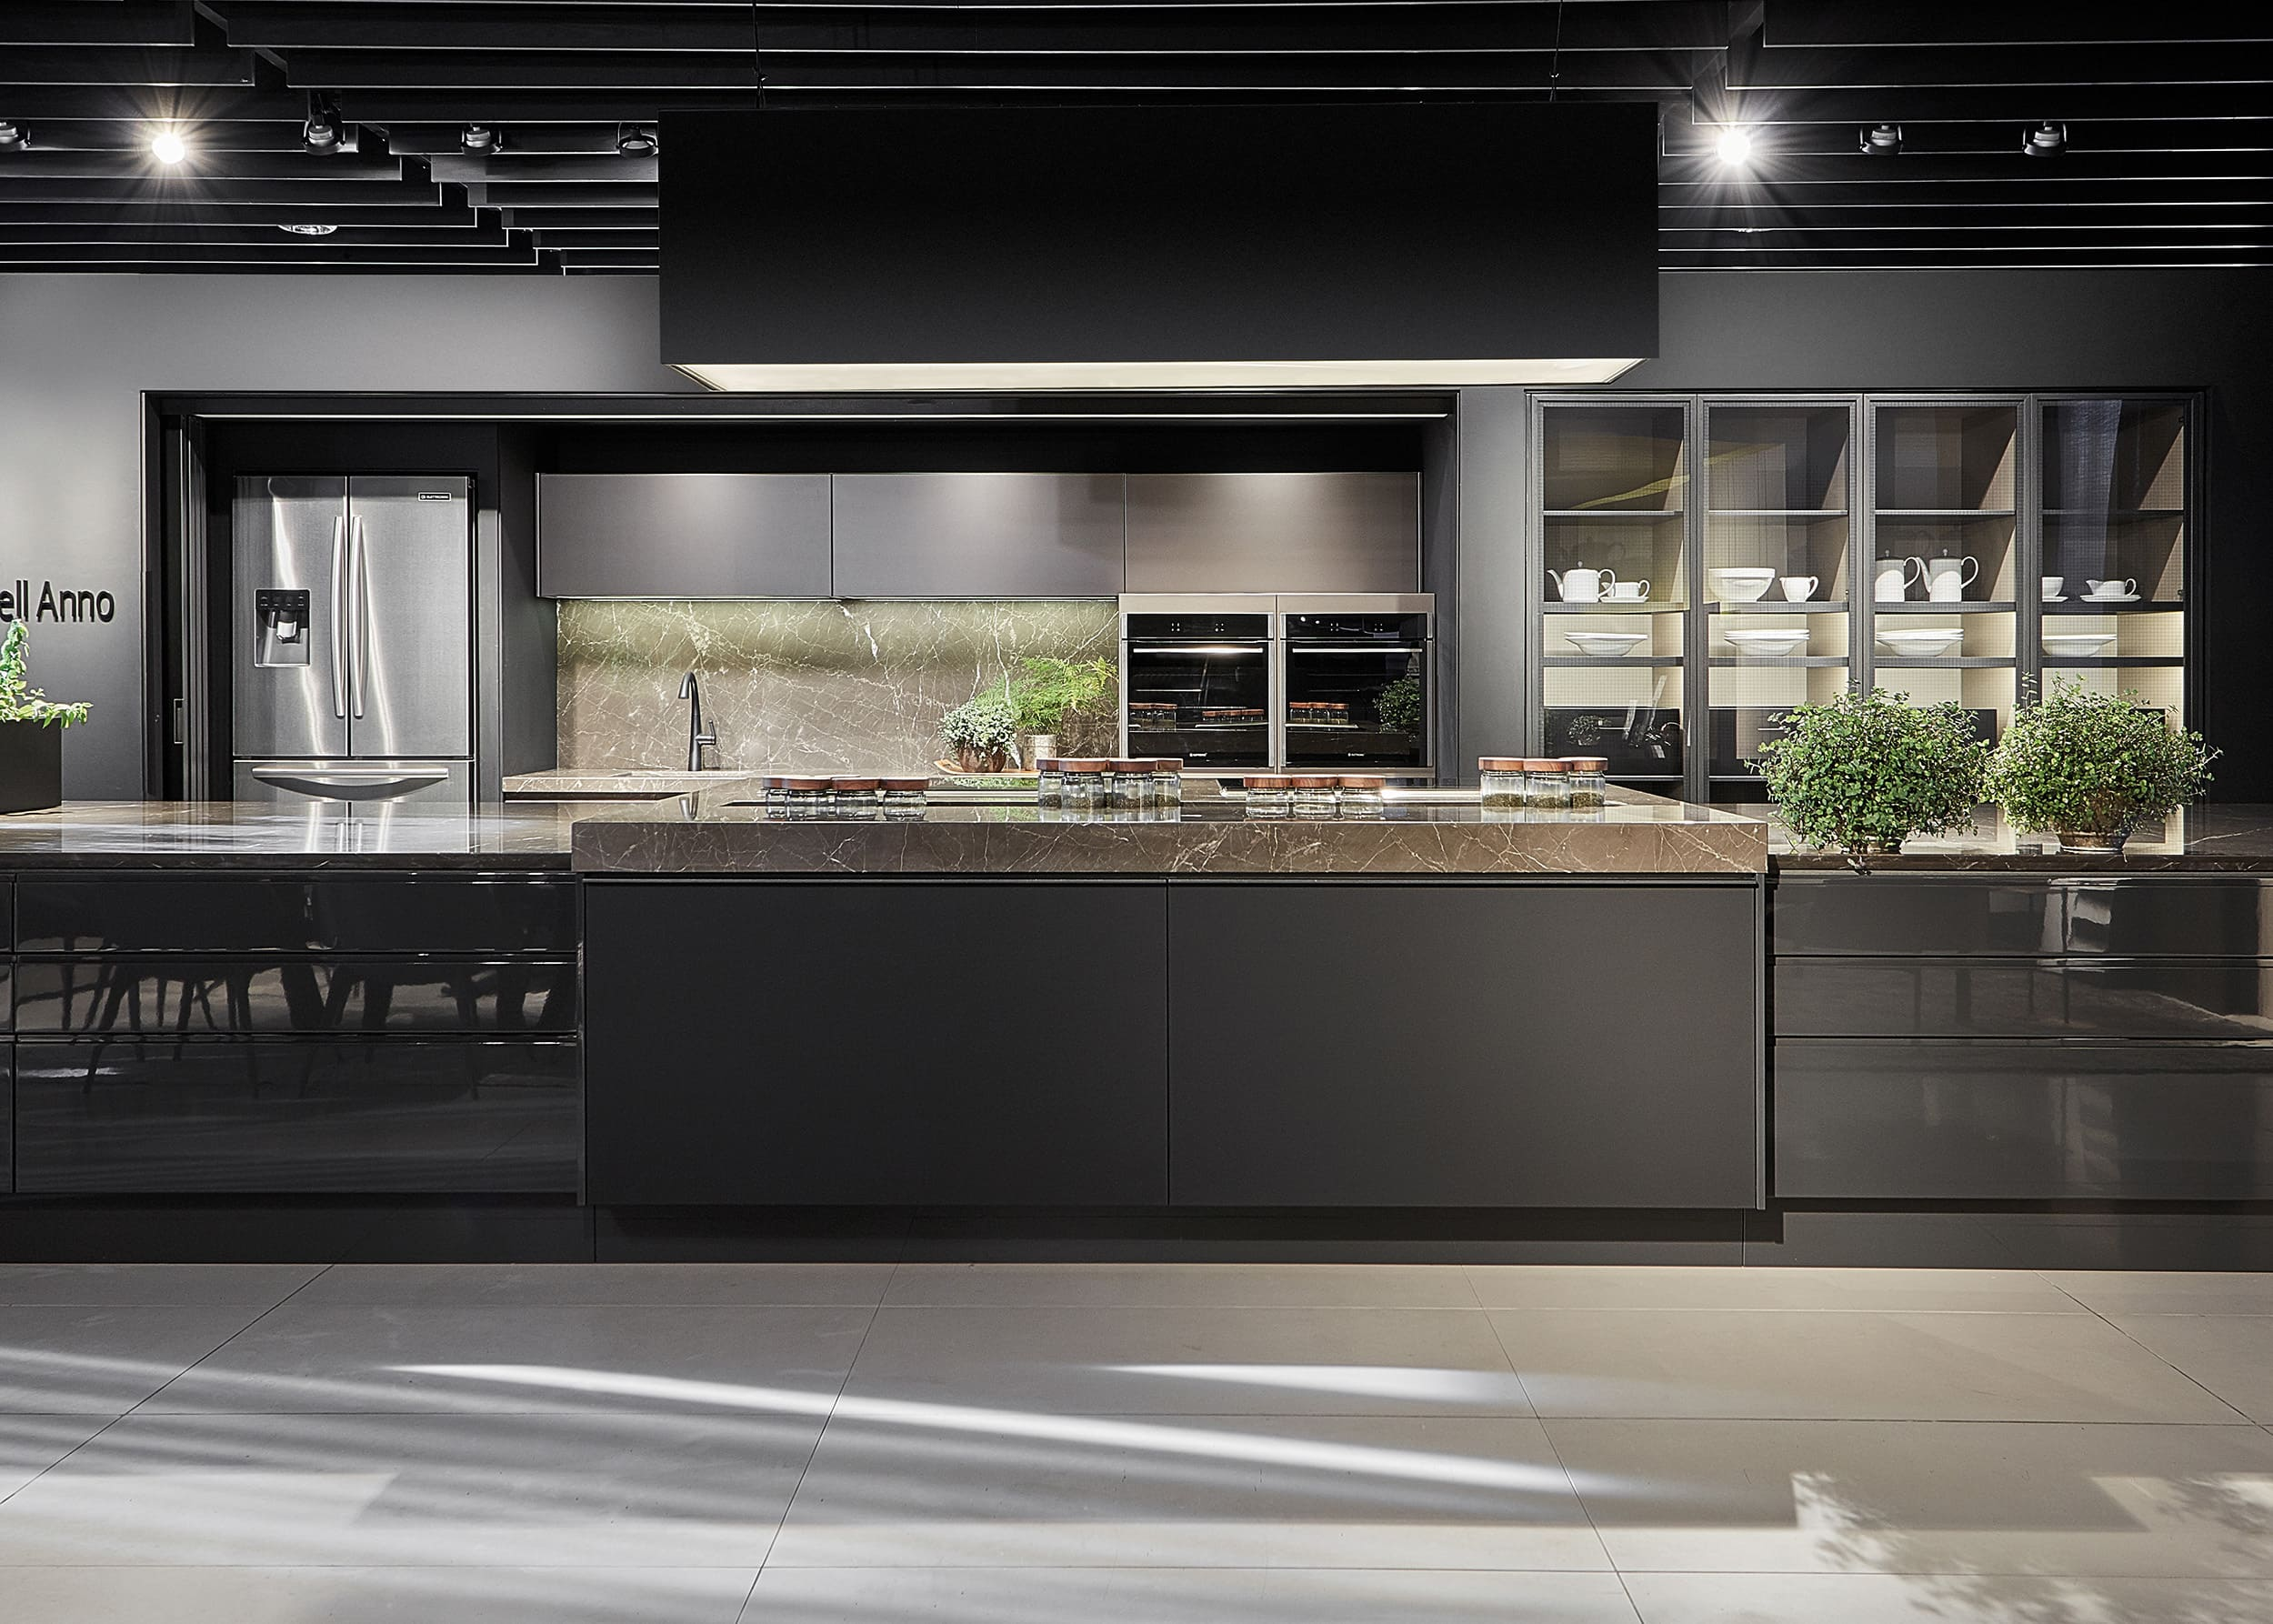 Cozinha Planejada Invisível Dell Anno - Tendência 2018